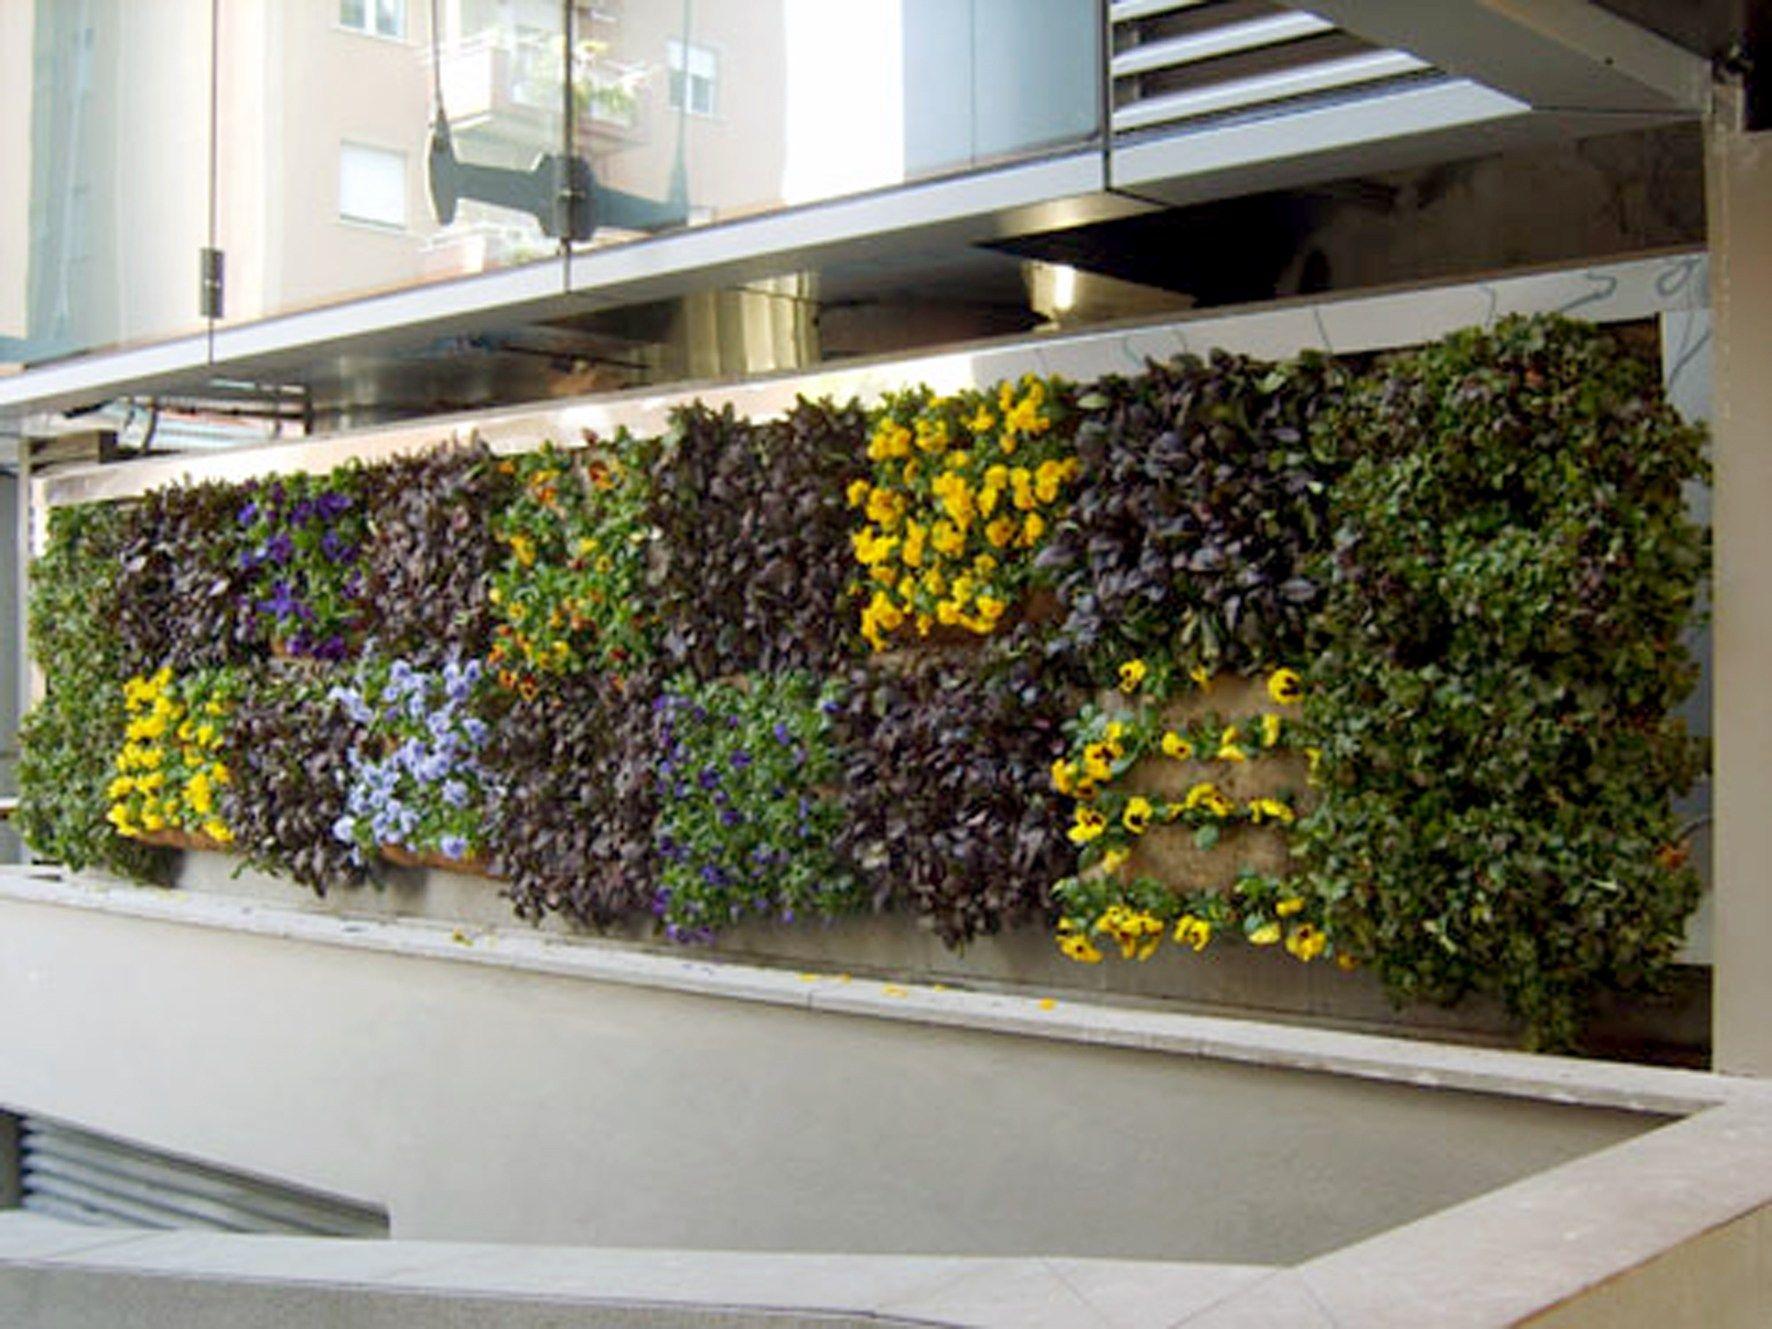 grade de jardim vertical:jardim equipamento para áreas externas grades para jardim vertical